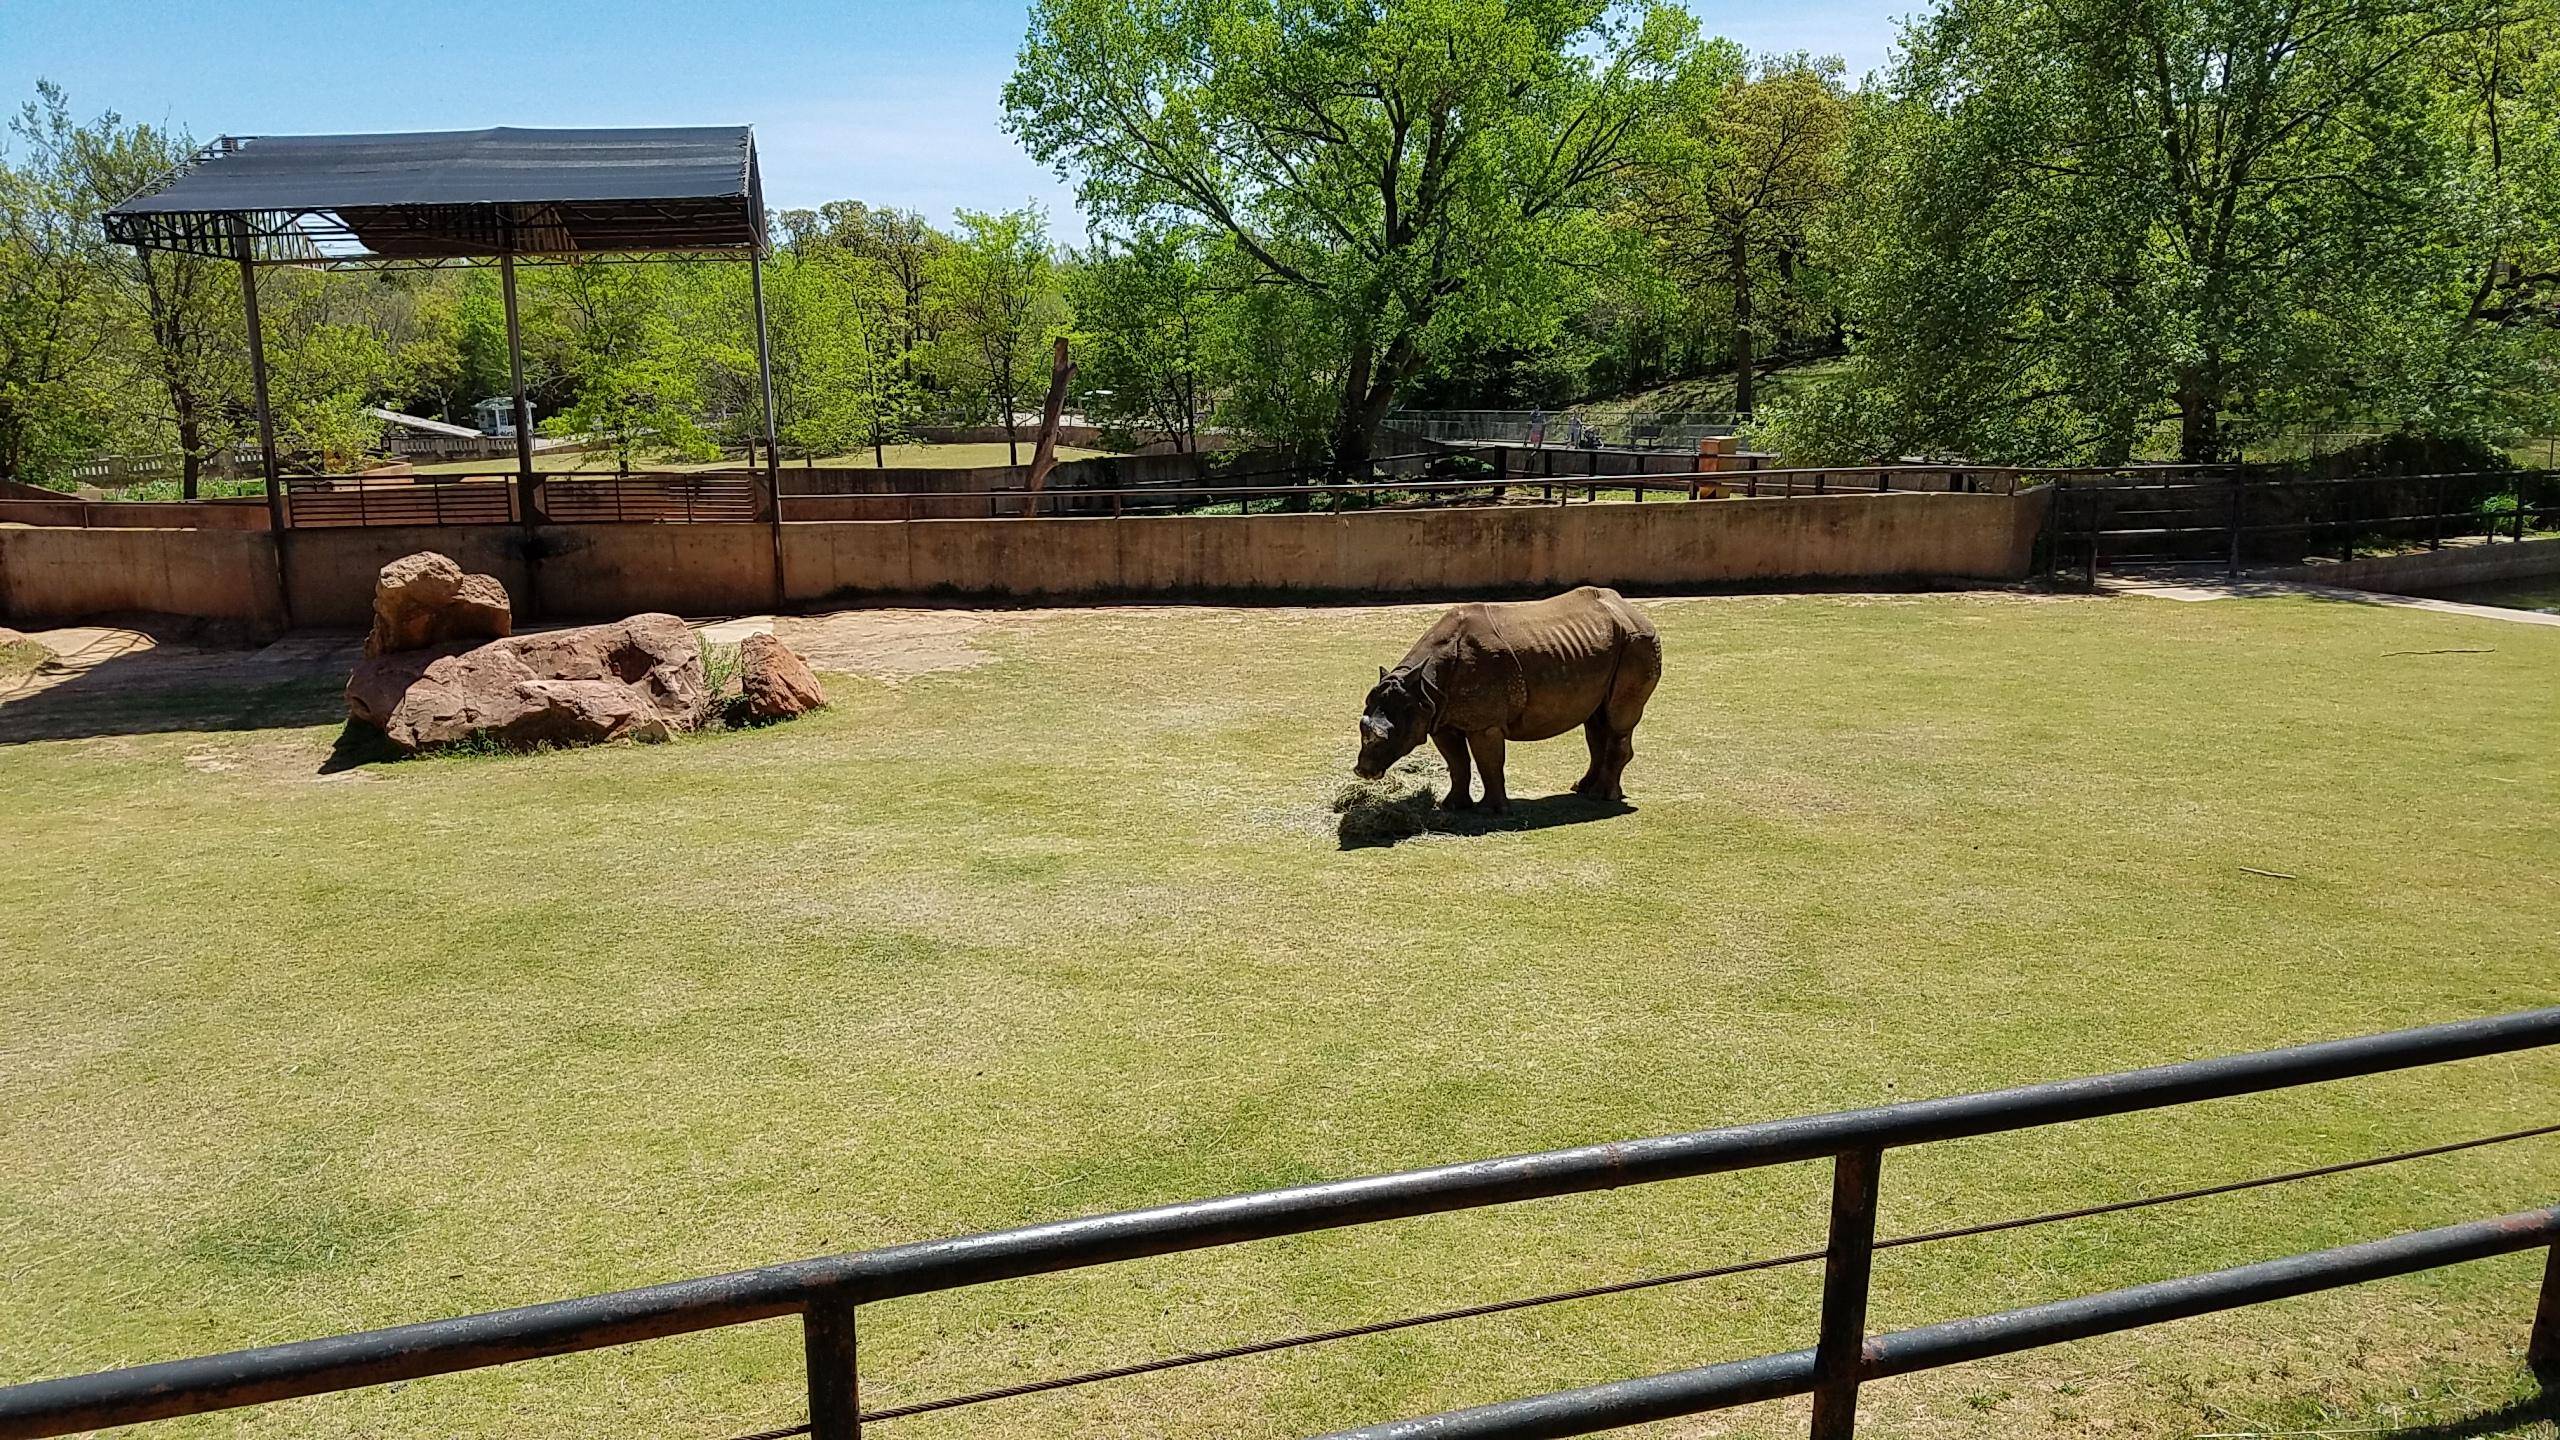 The oklahoma city zoo rv 39 ing with herb kathy Oklahoma city zoo and botanical garden